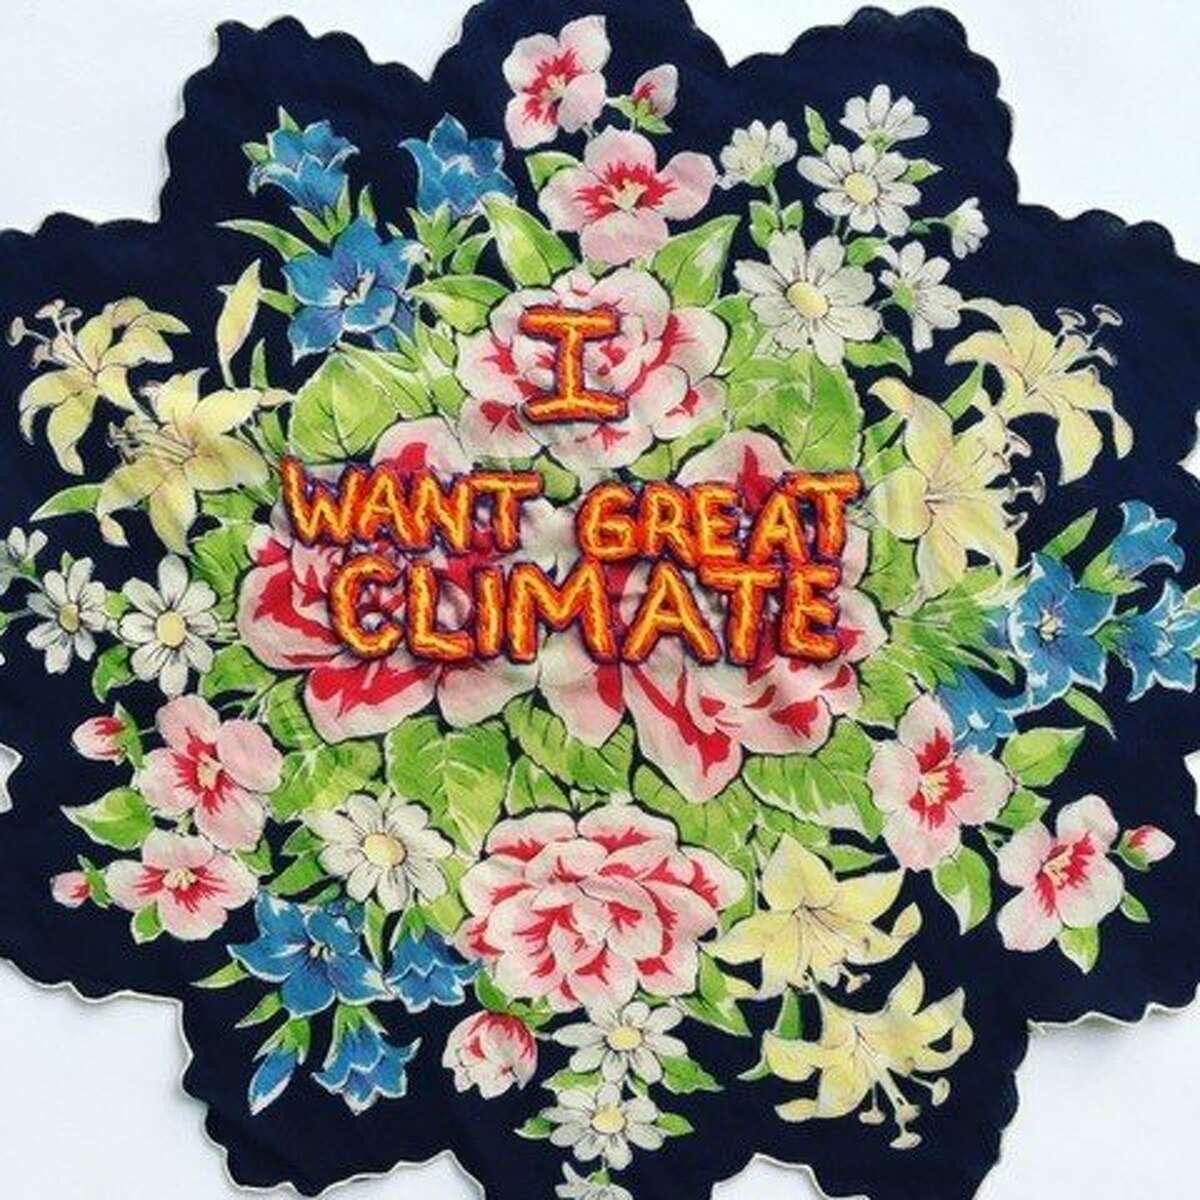 'Climate Hankie,' part of Diana Weymar's Tiny Pricks art project